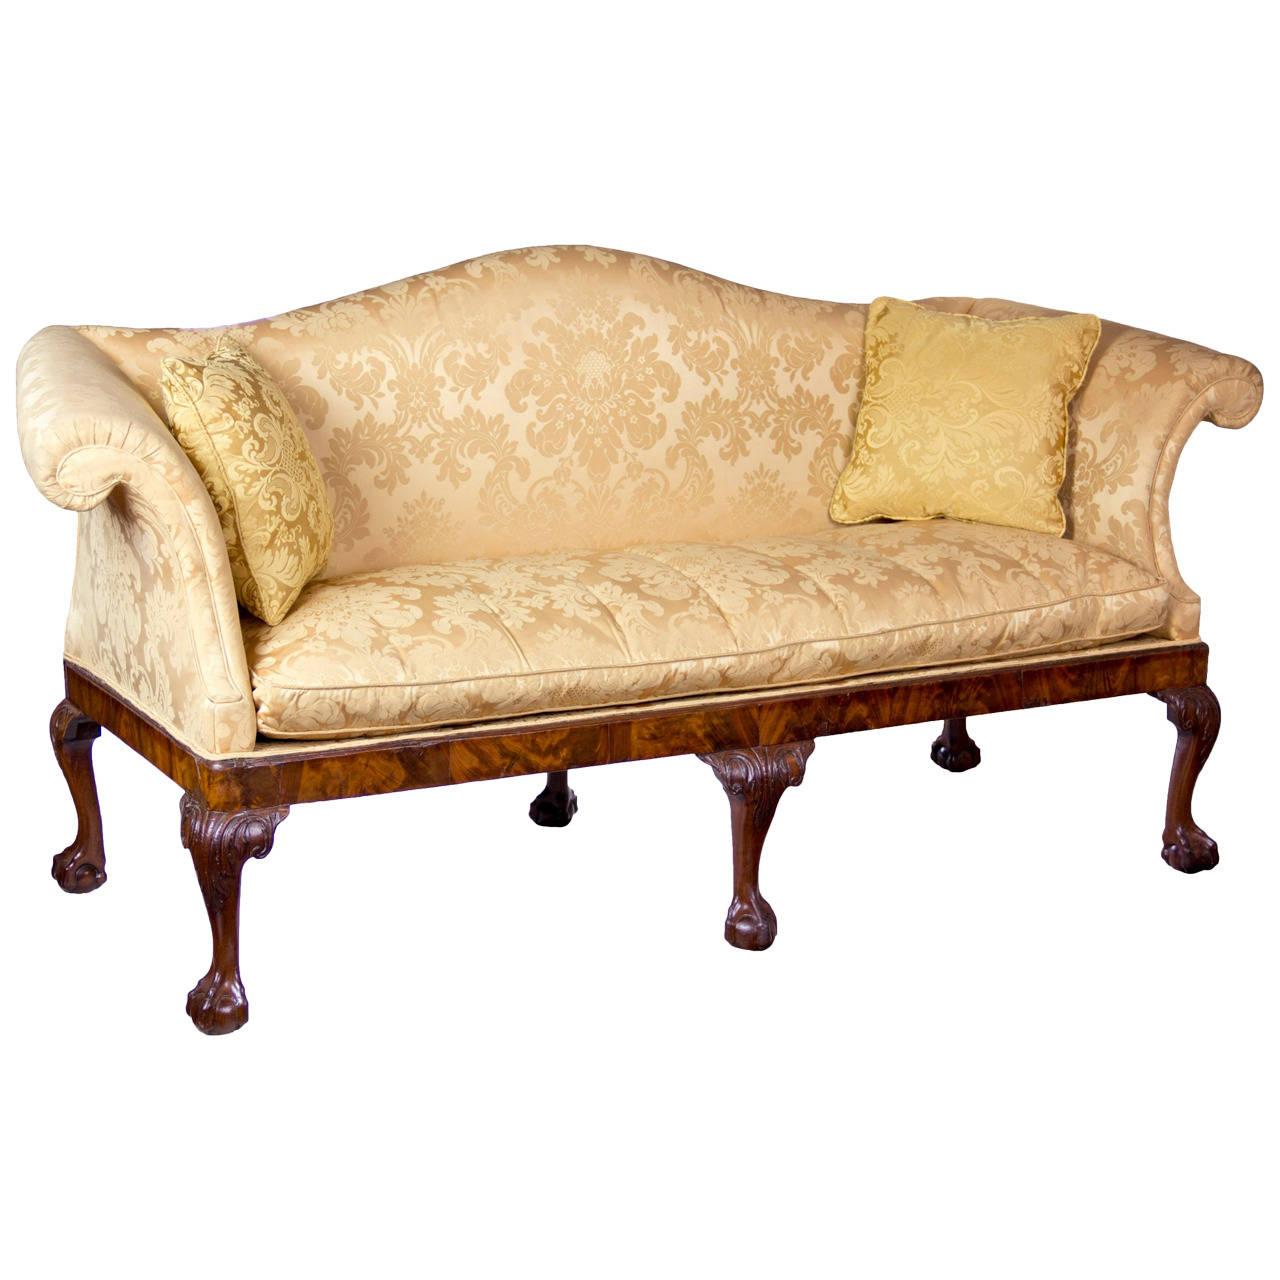 Enjoyable 1Stdibs Sofa Camelback Claw Ball Feet Irish Circa 1770 Inzonedesignstudio Interior Chair Design Inzonedesignstudiocom